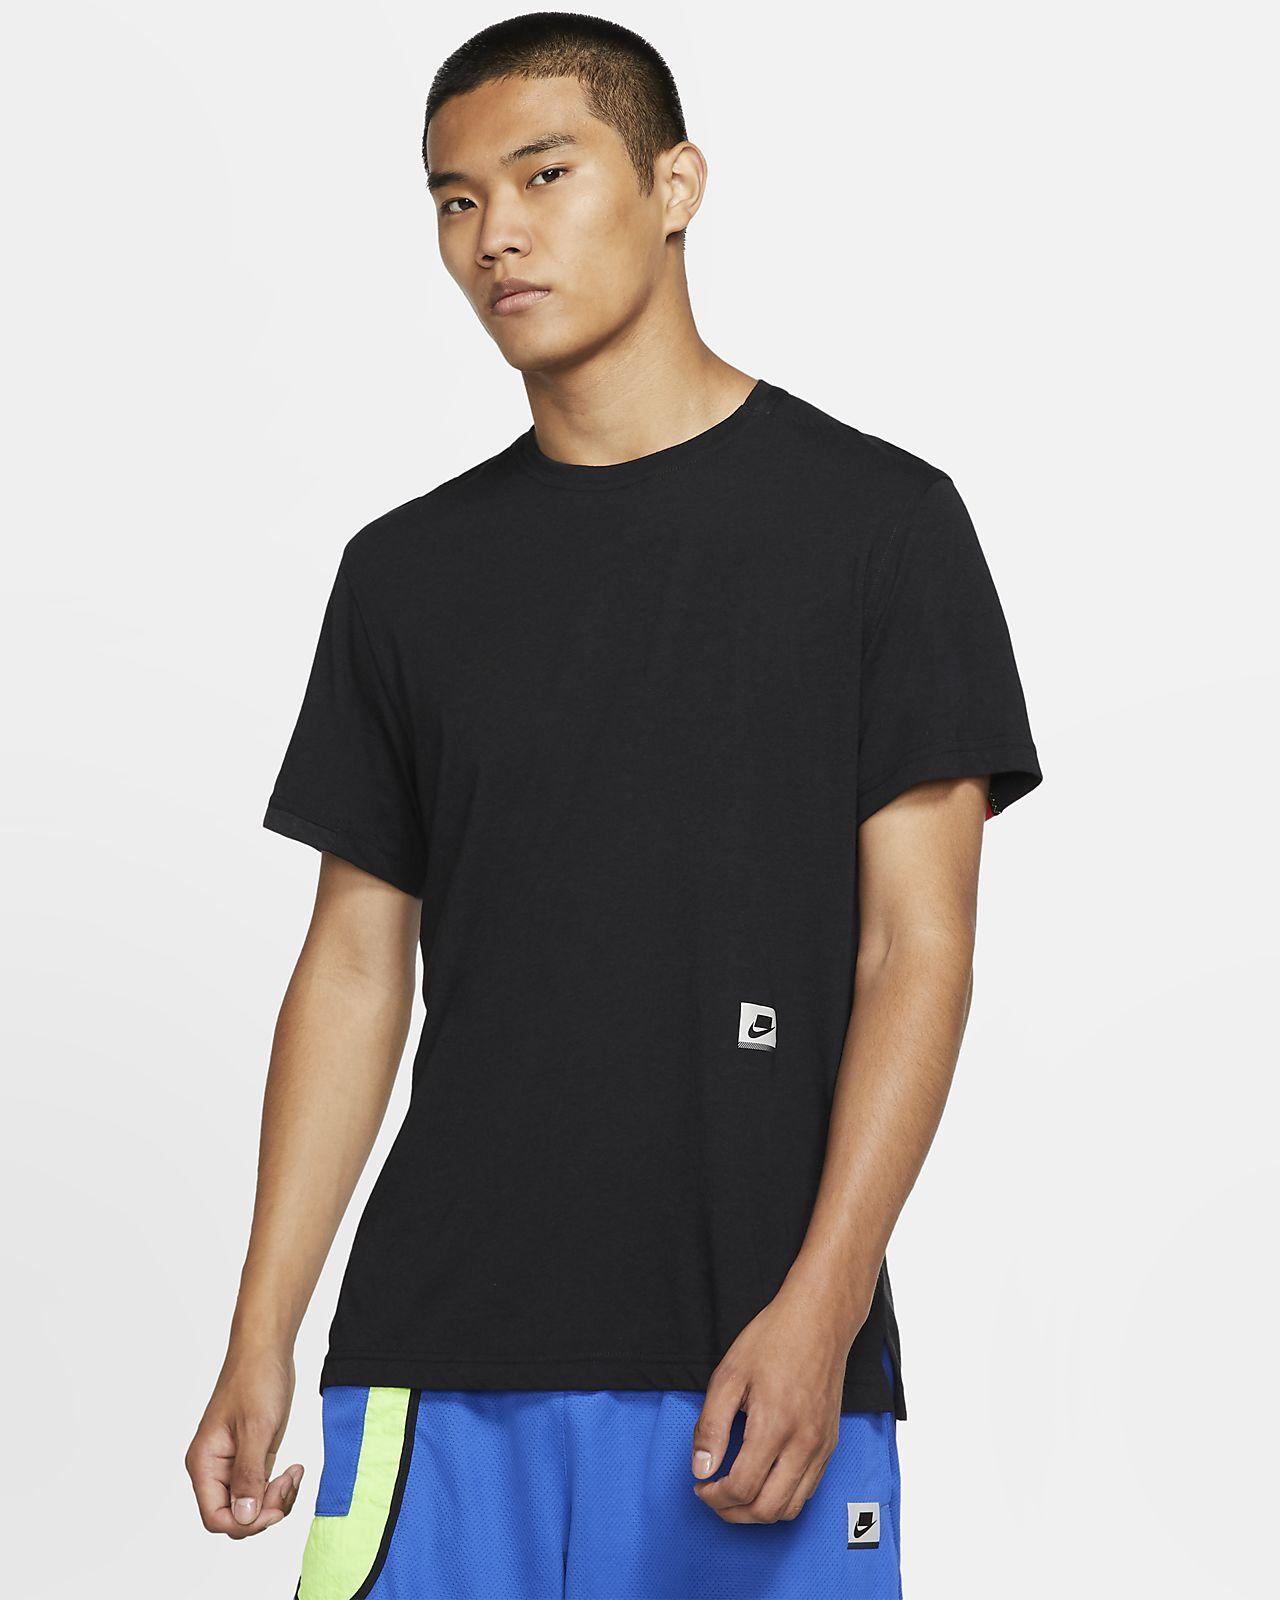 Nike Dri-FIT 男子短袖训练上衣